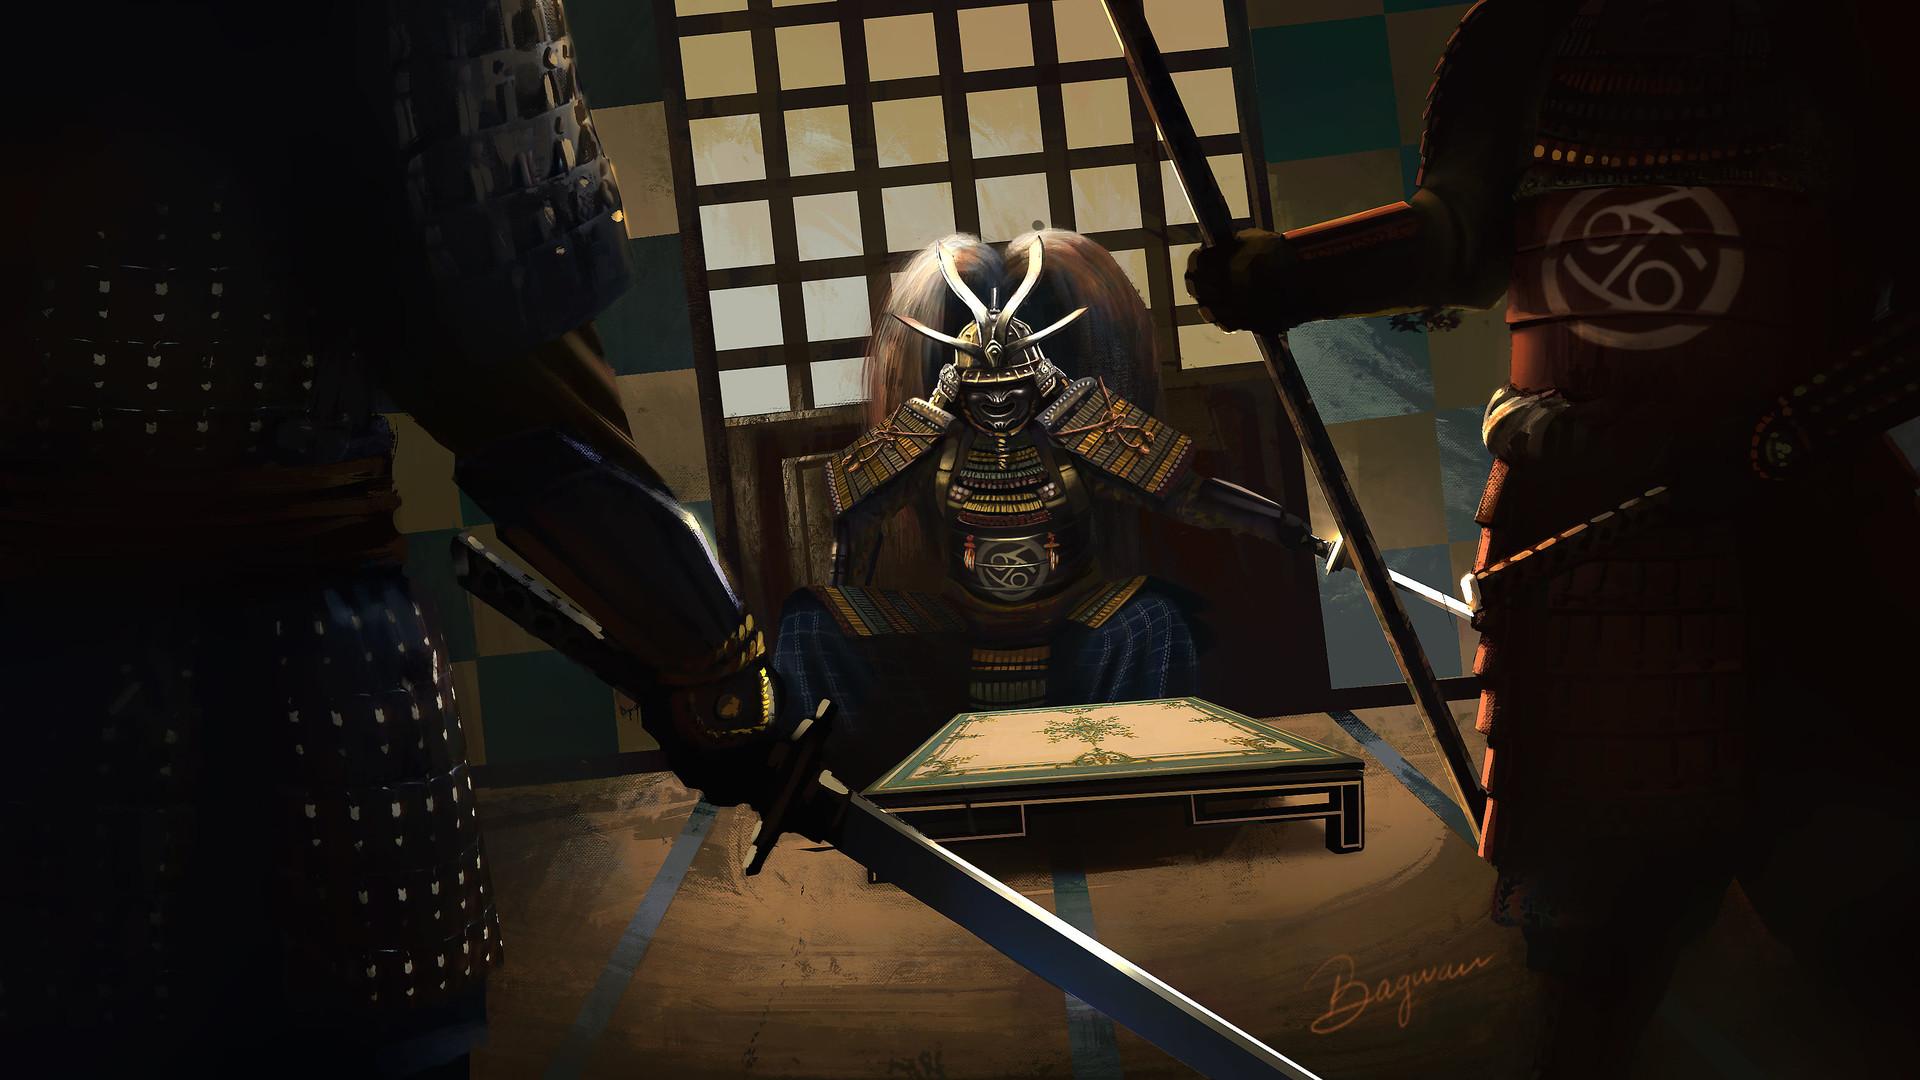 Nicolas chacin samurai4